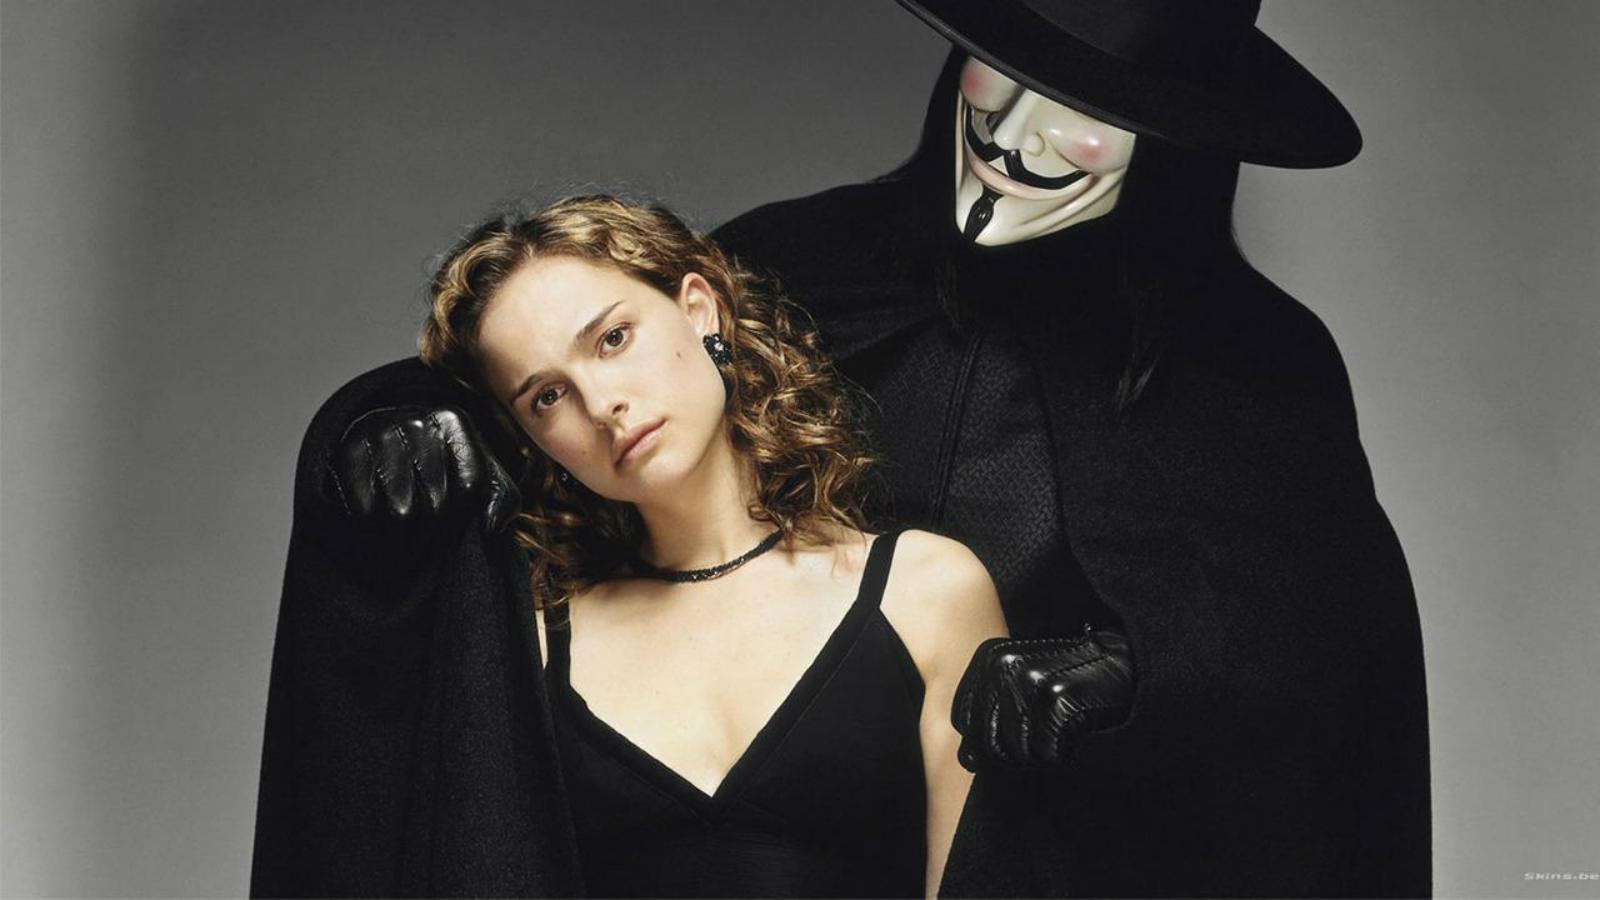 http://1.bp.blogspot.com/-OkAPS0HneMU/TlrLzeOAl8I/AAAAAAAAAuU/cYhkVrNGzo4/s1600/vendetta_guy_fawkes_wallpaper_movies_black_and_white_wallpaper_.jpg